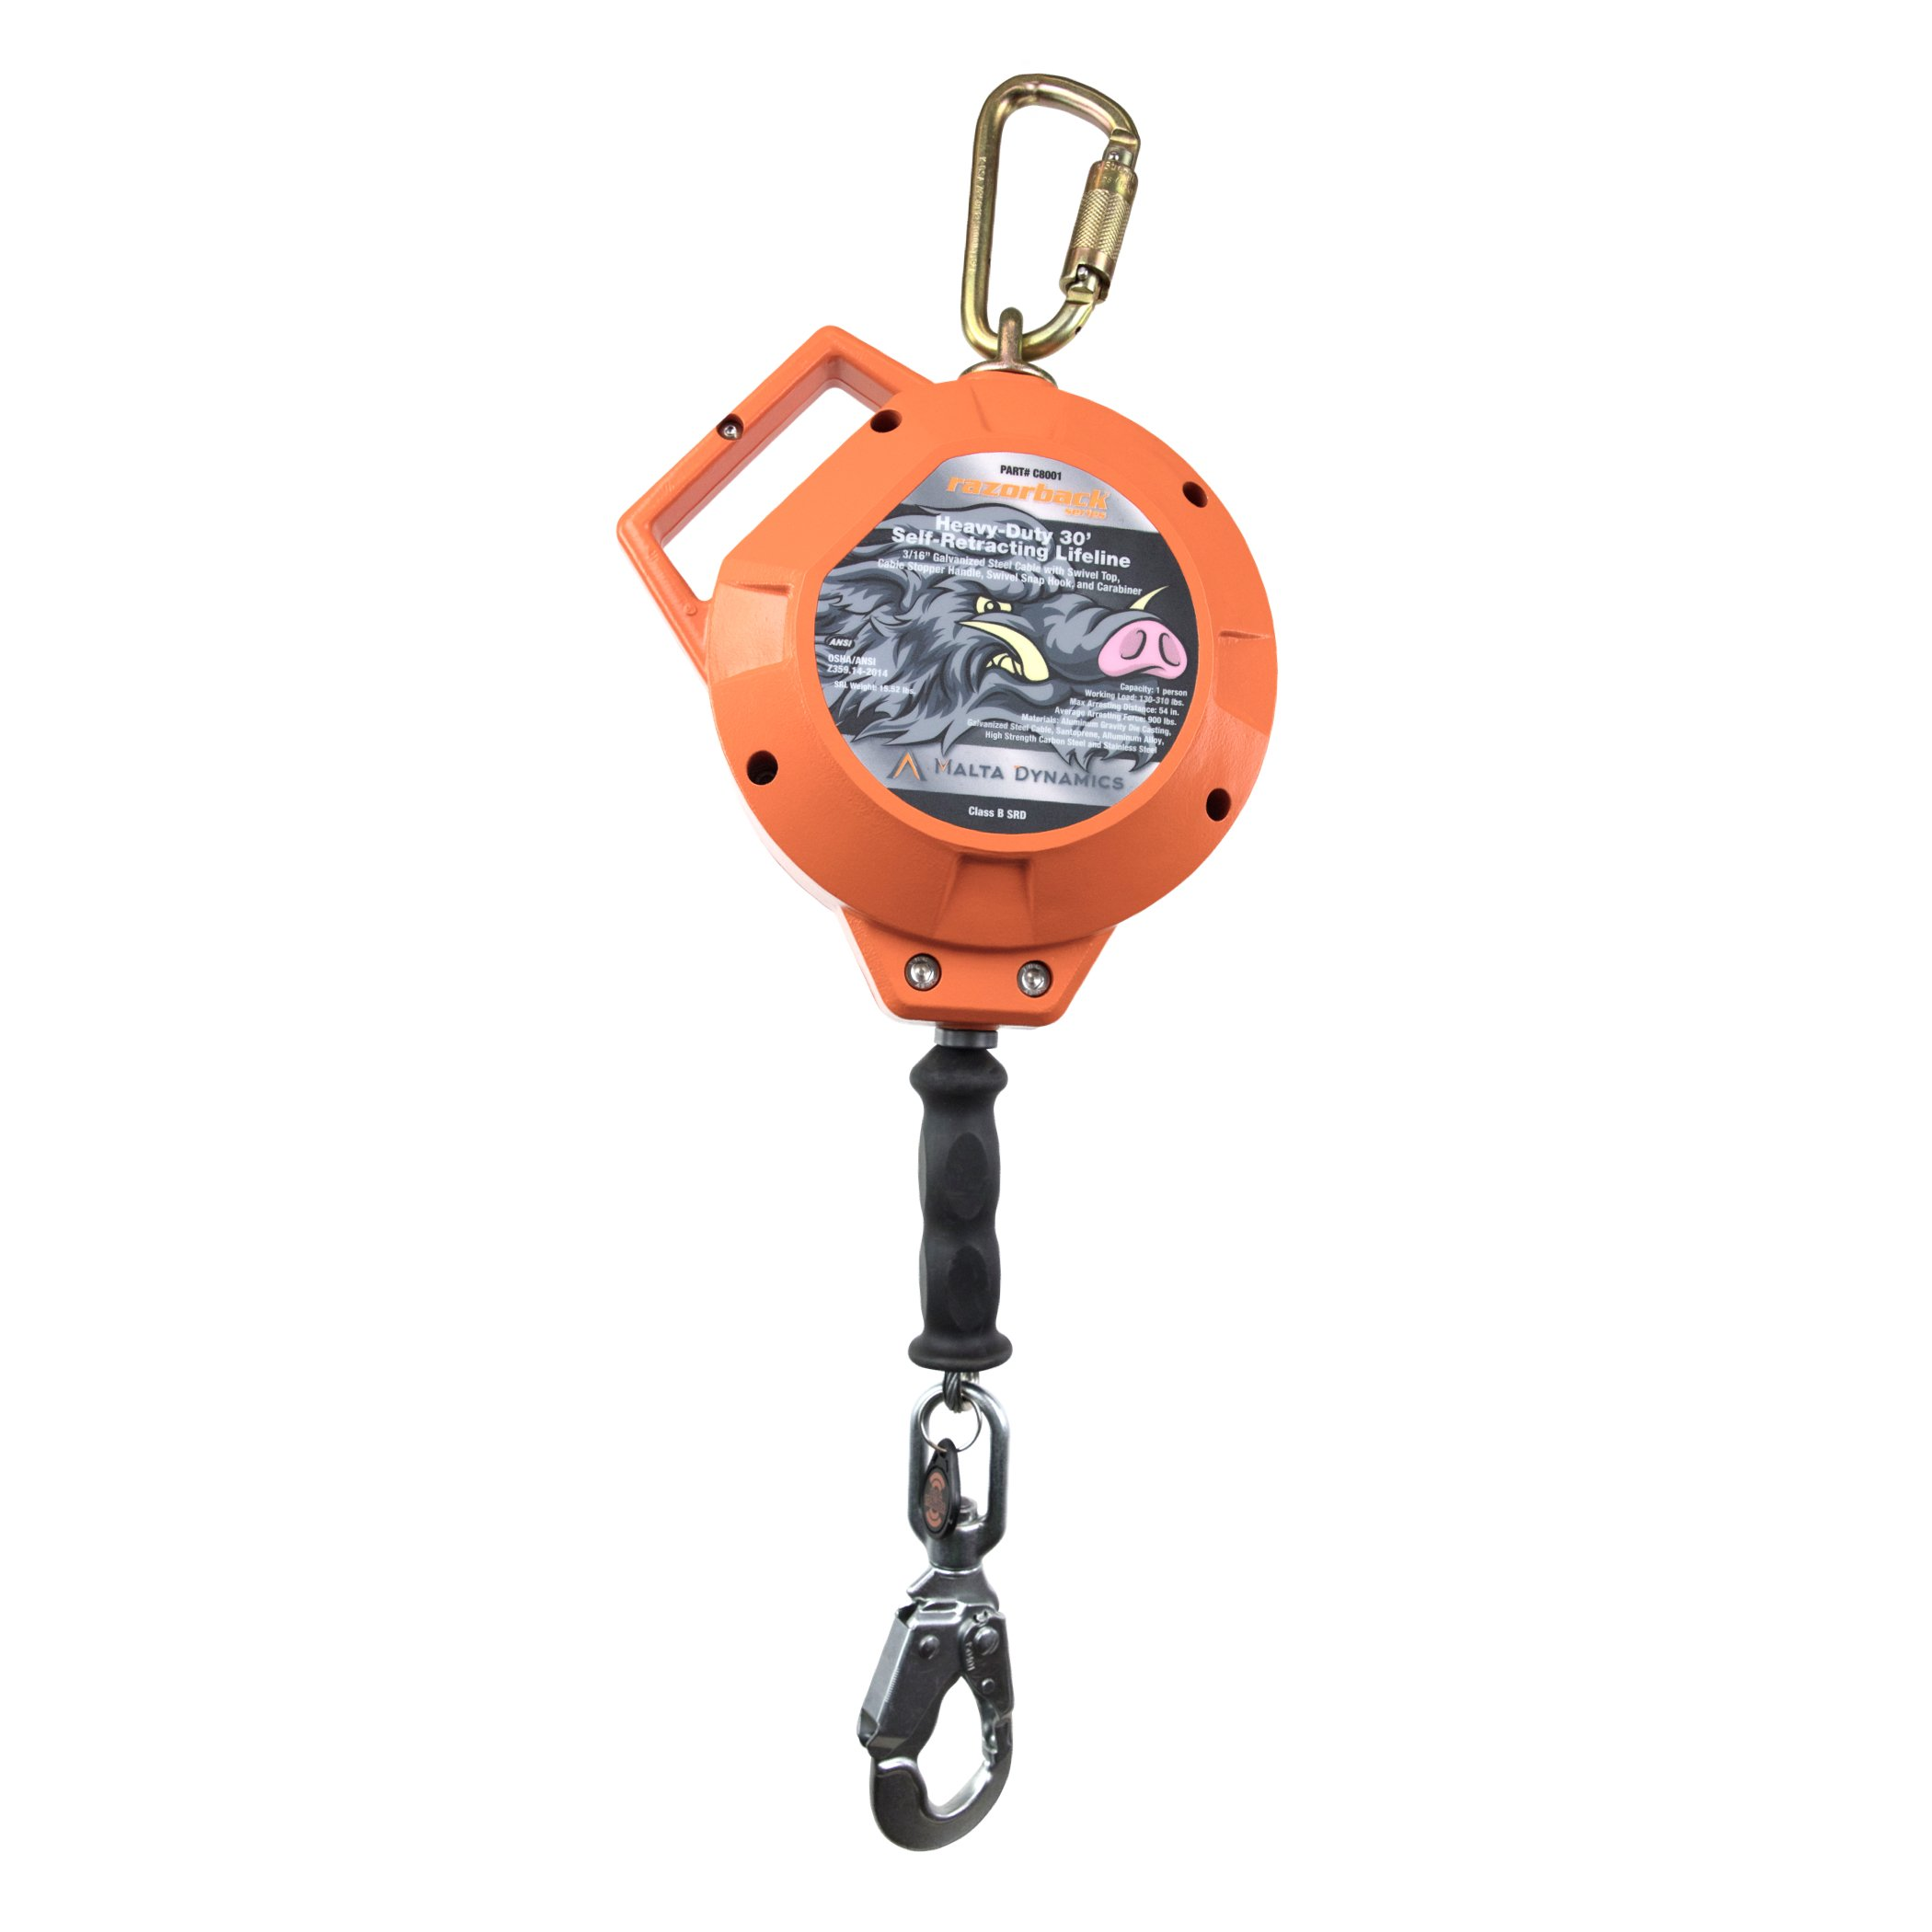 Malta Dynamics Fall Protection, 30-Feet Razorback Heavy-Duty Cable Self Retracting Lifeline with Steel Snap Hook & Carabineer, OSHA/ANSI Compliant